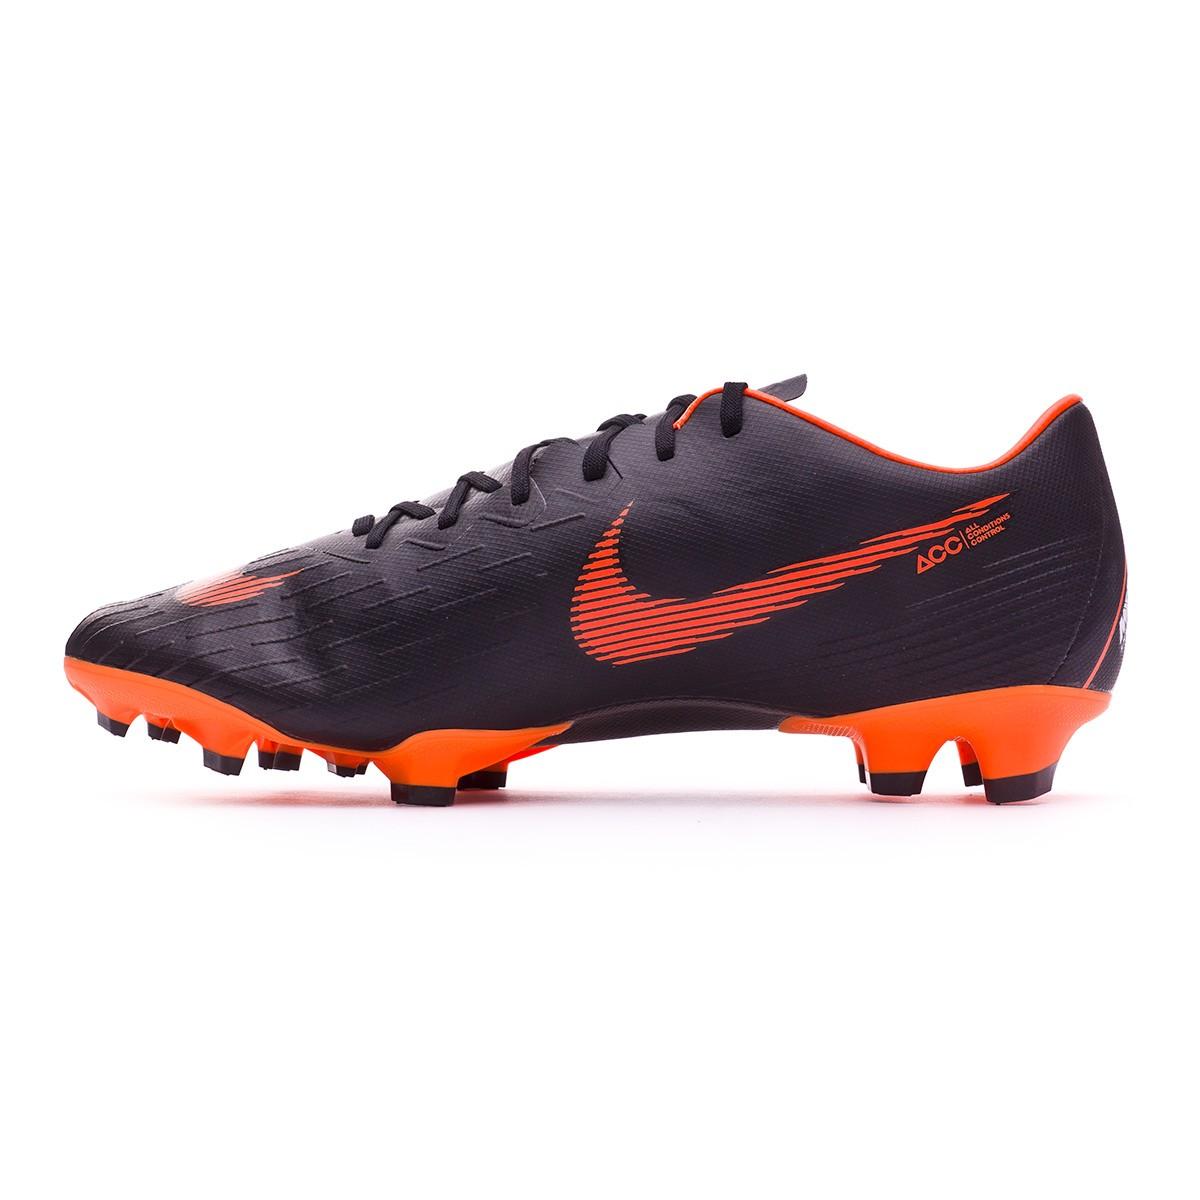 super cute da175 3e9d0 Boot Nike Mercurial Vapor XII Pro FG Black-Total orange-White -  Soloporteros es ahora Fútbol Emotion